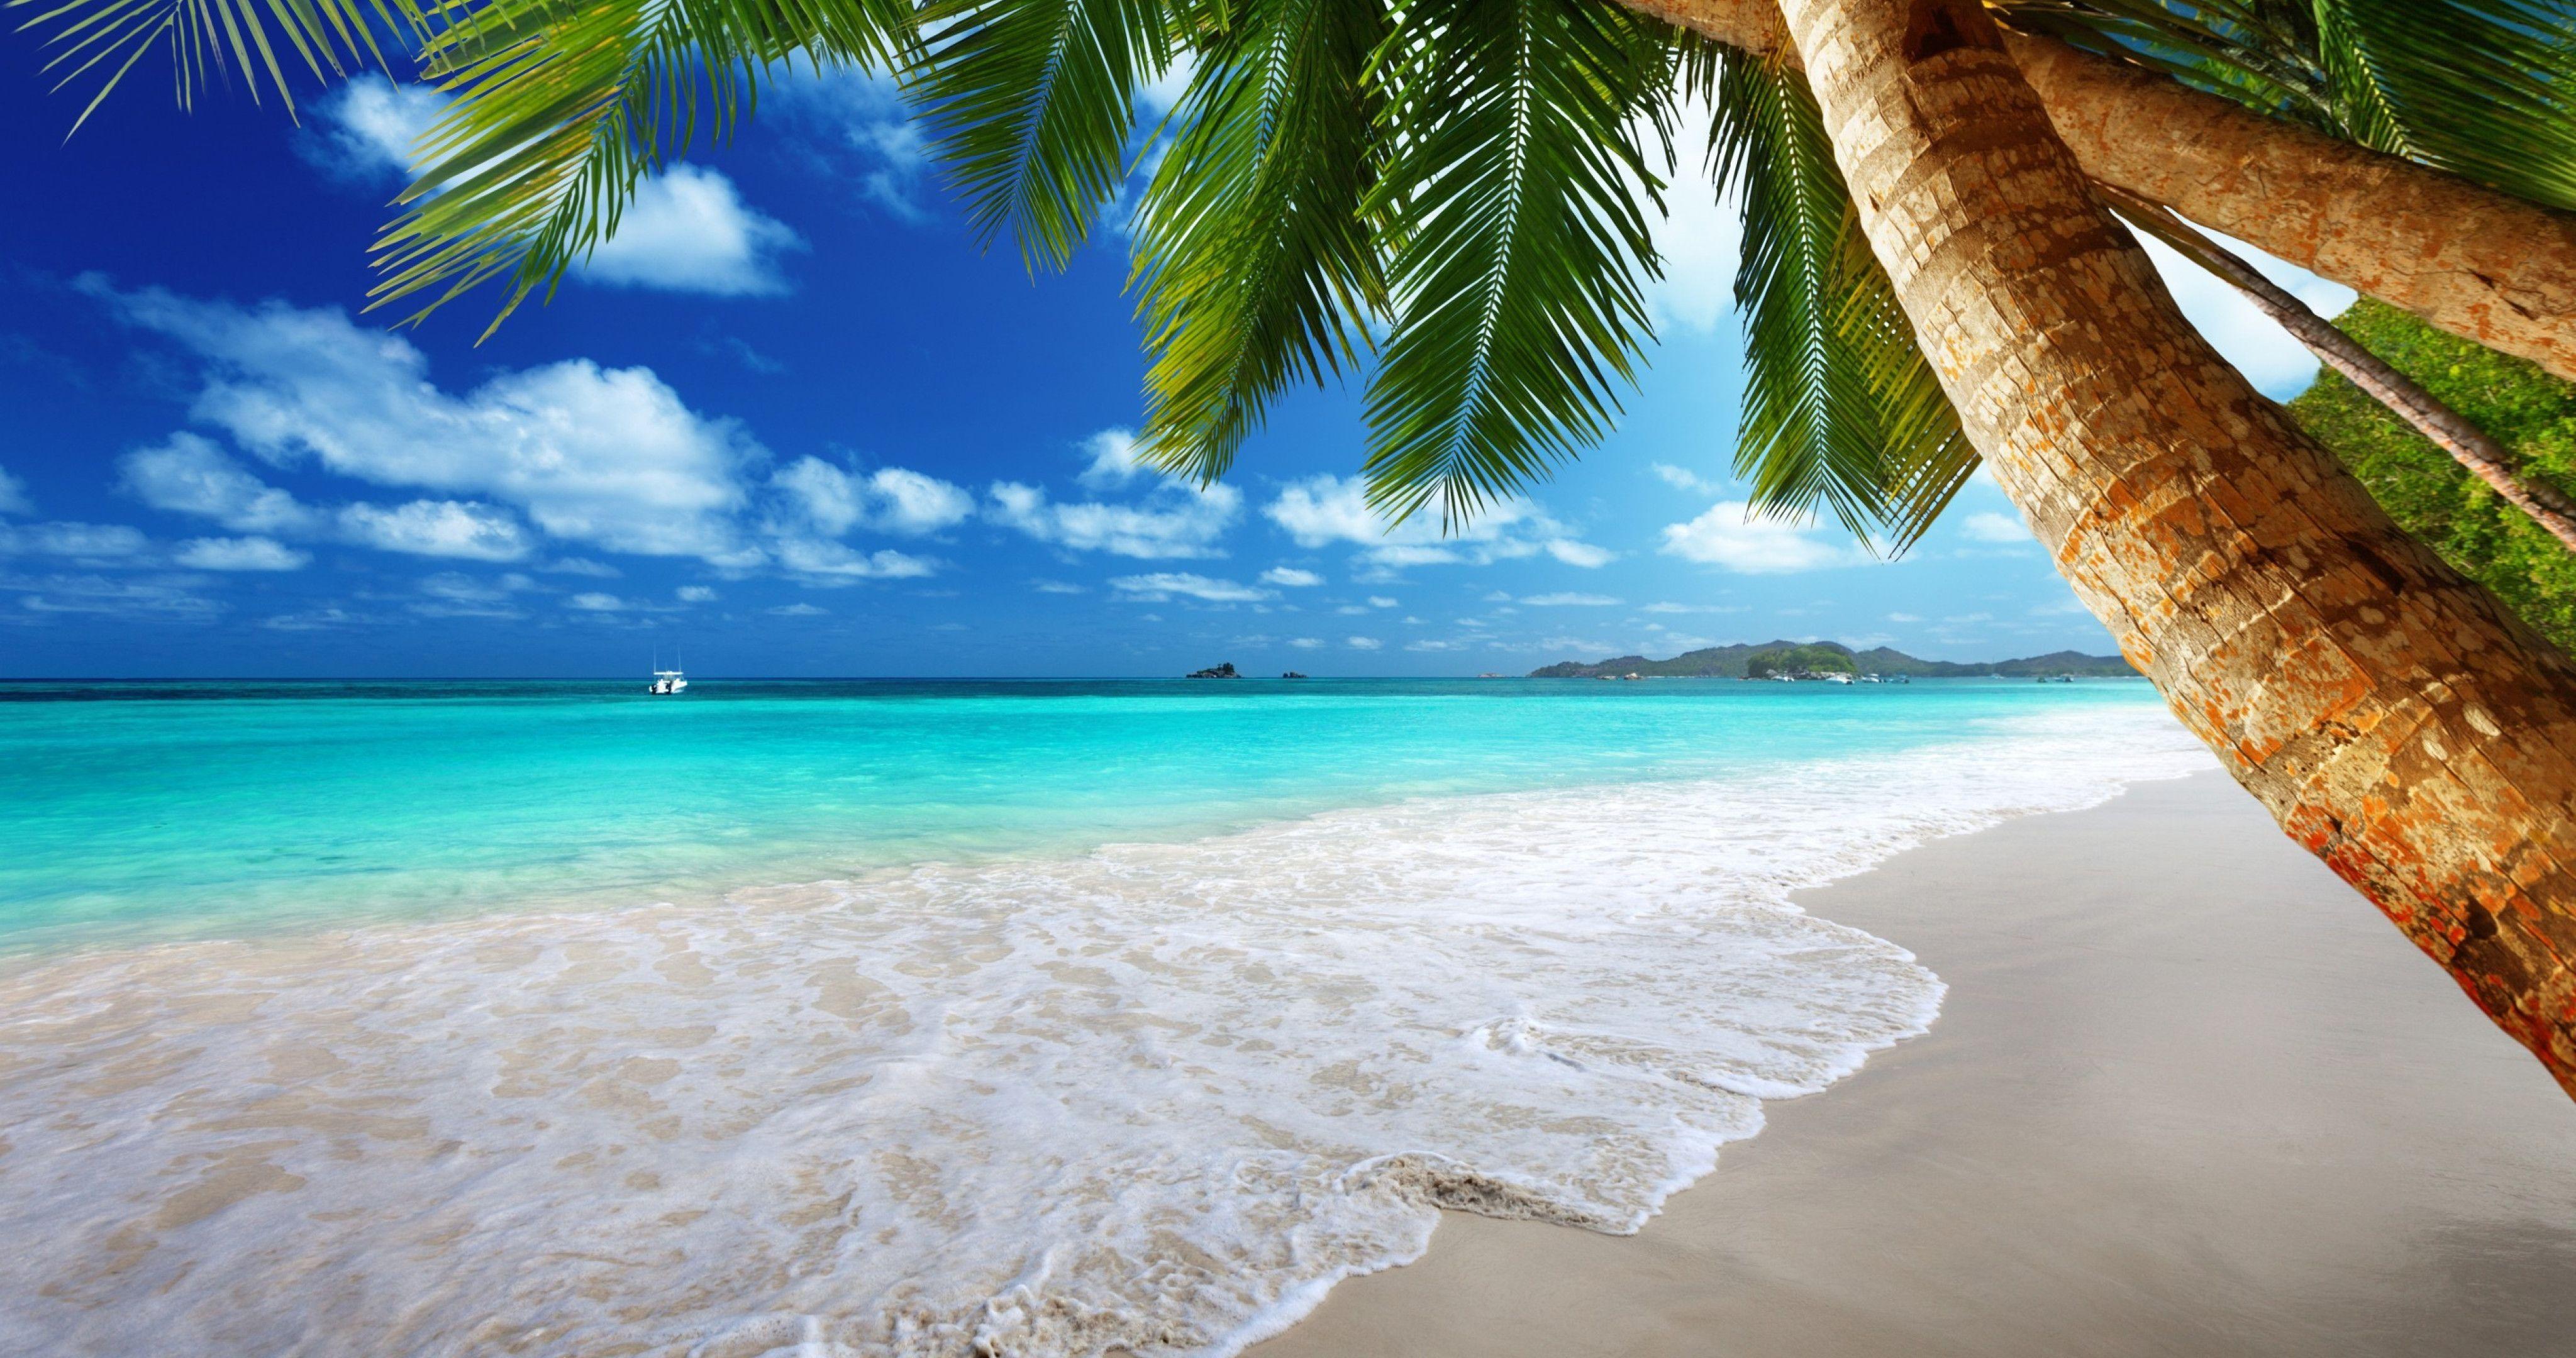 4K Beach Wallpapers - Top Free 4K Beach Backgrounds ...